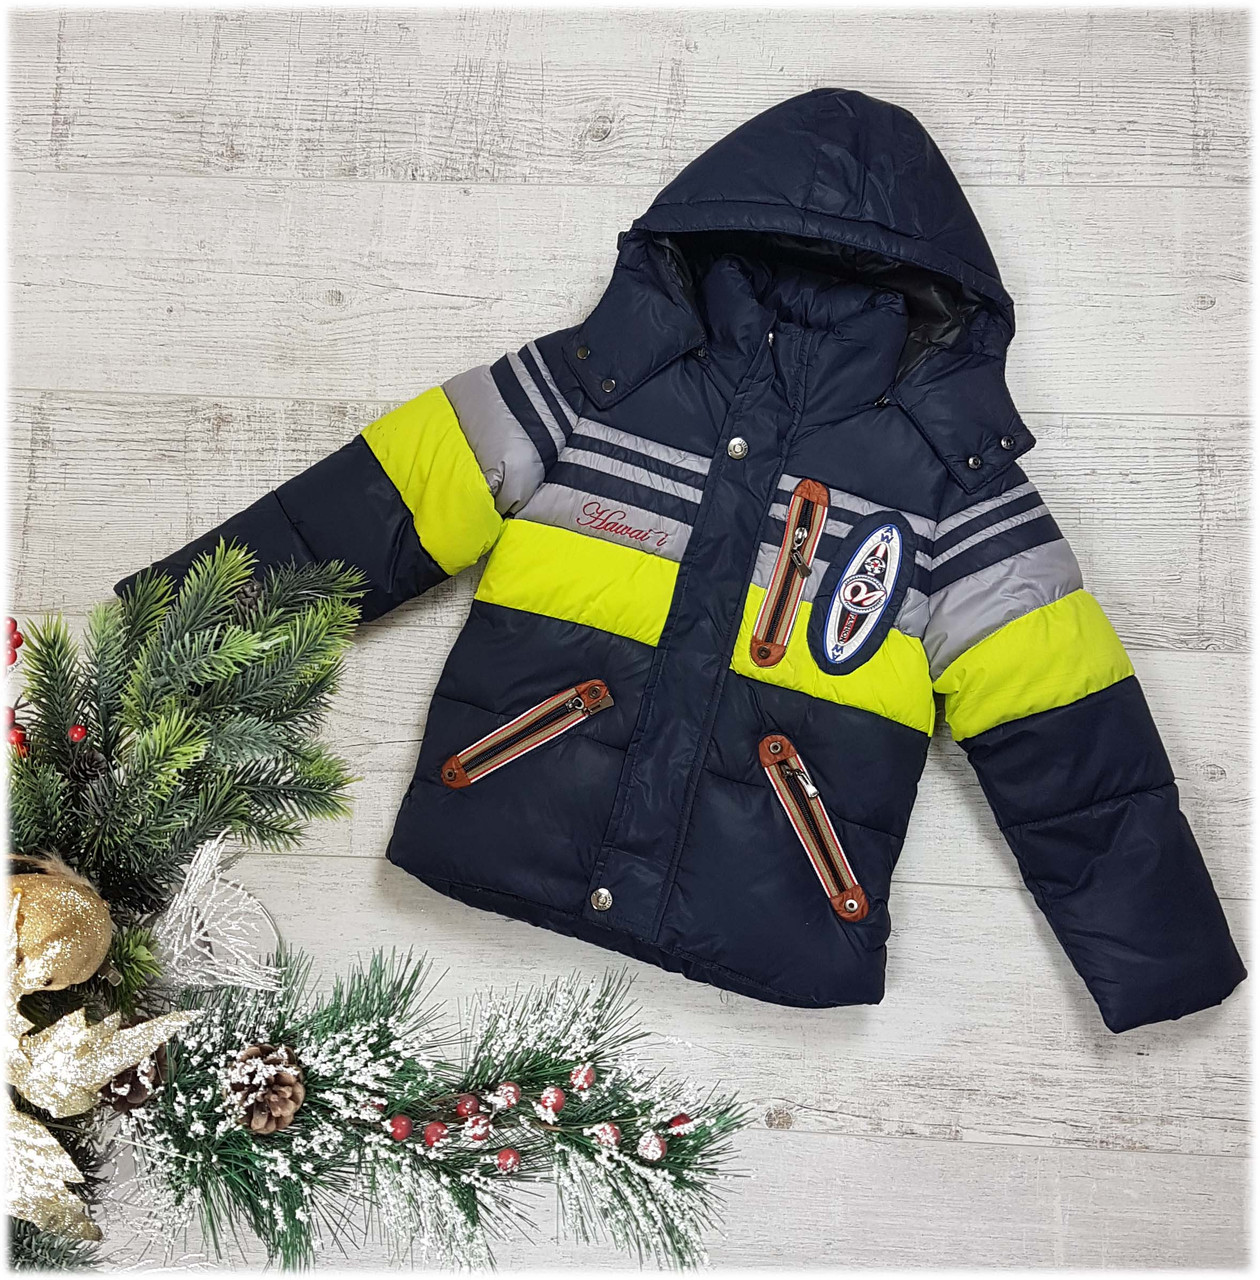 Куртка зимняя wa 1505,100% холлофайбер, теплая, размеры 92 -146 см, фото 1